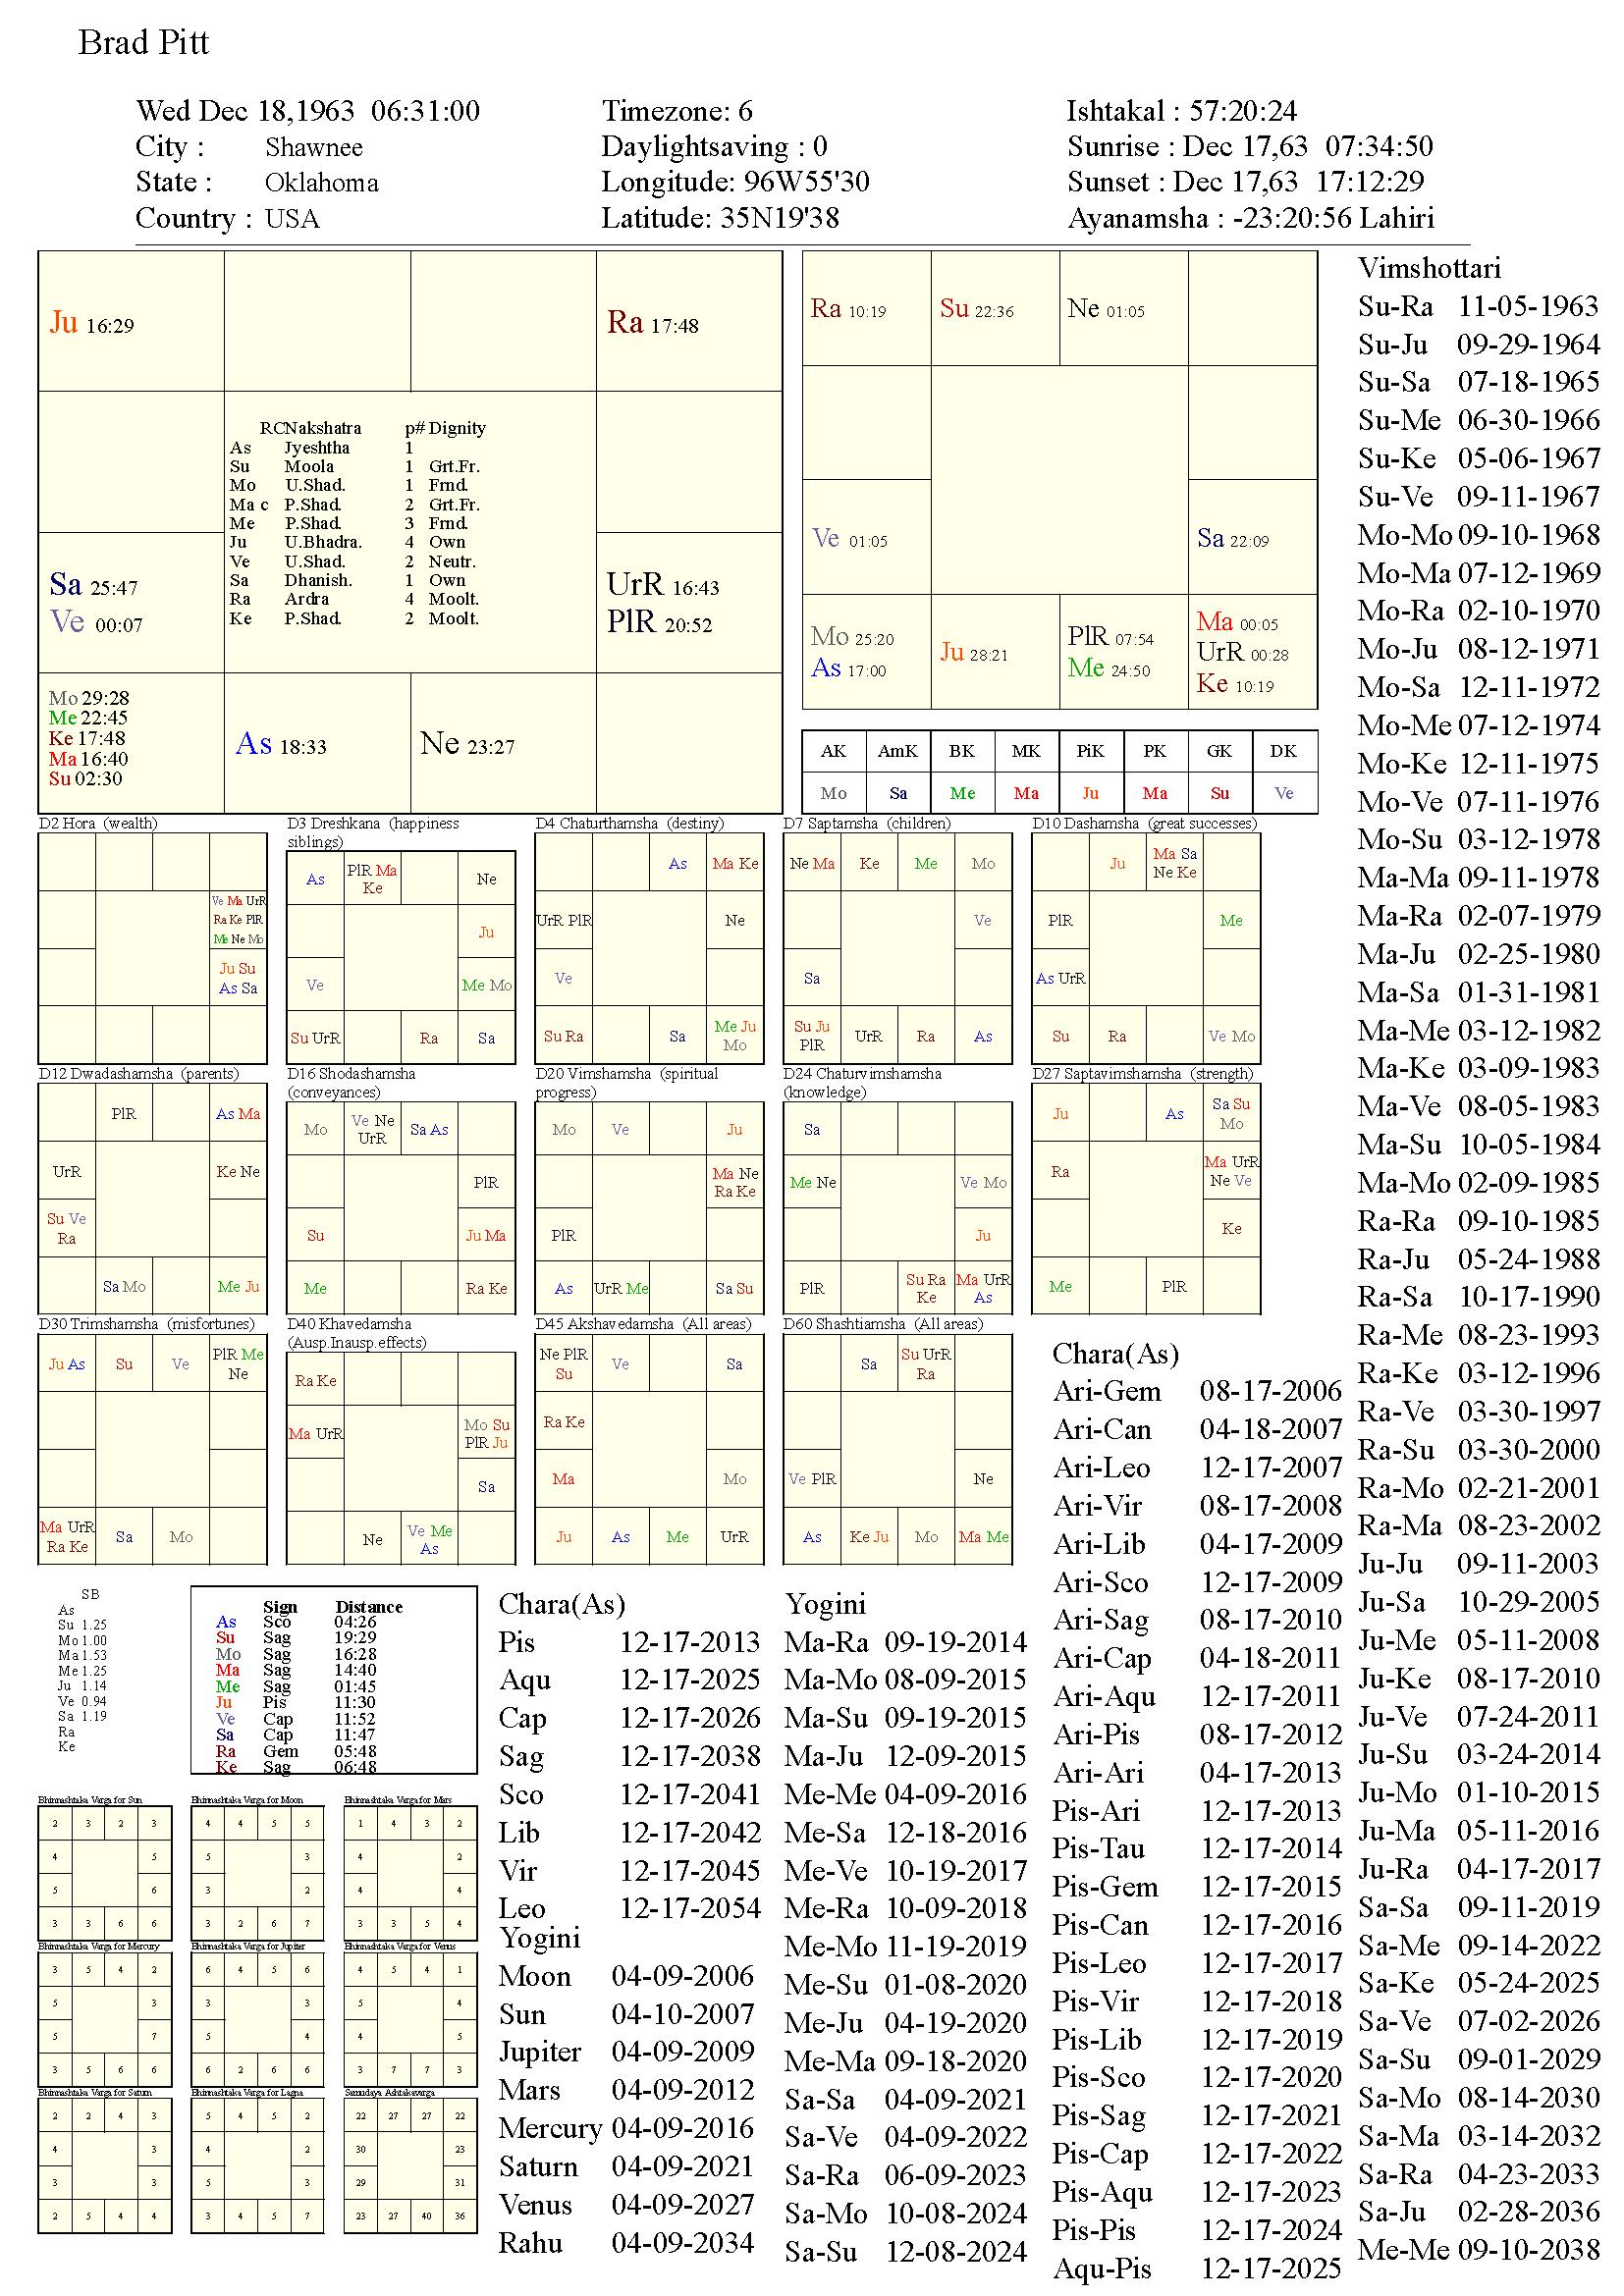 bradpitt_chart